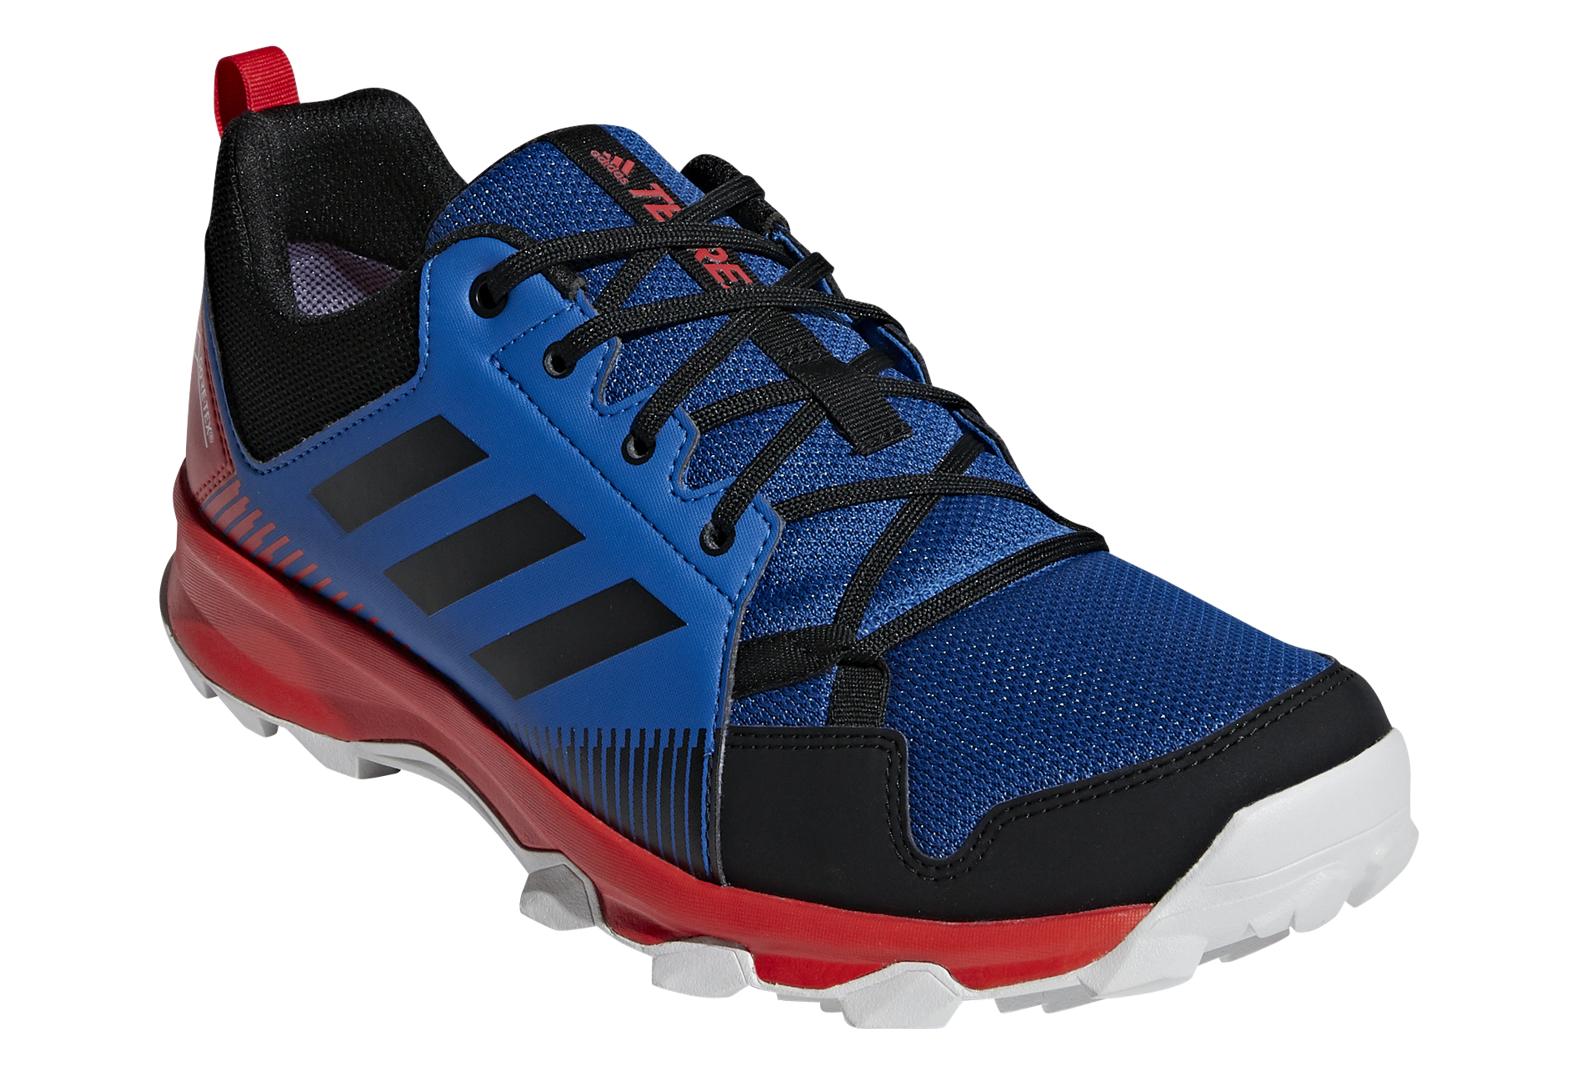 reputable site b472e 9cca4 Chaussures adidas Terrex Tracerocker GTX